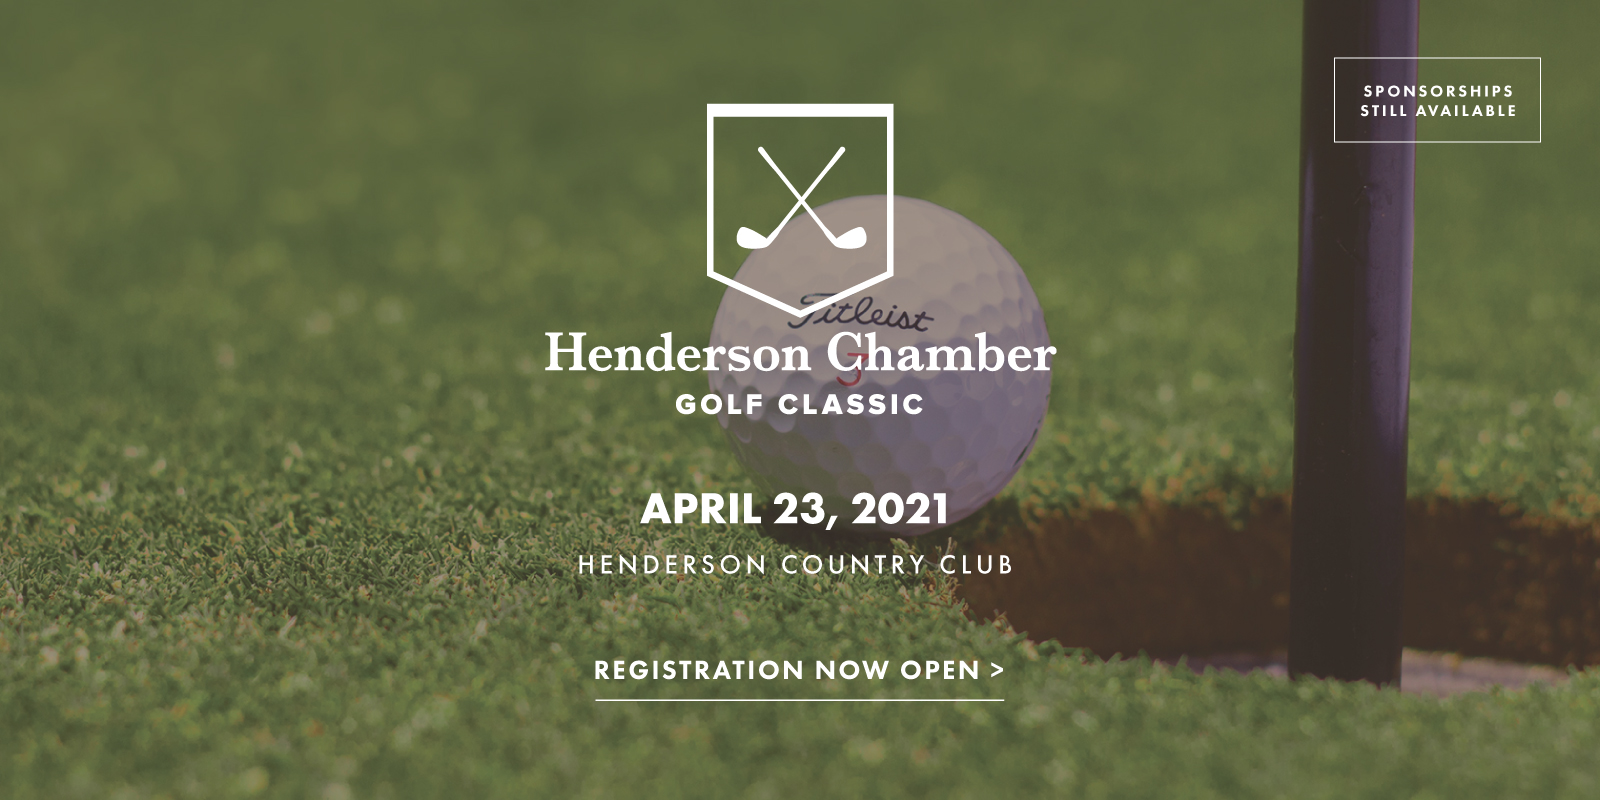 HendersonChamber_GolfClassic